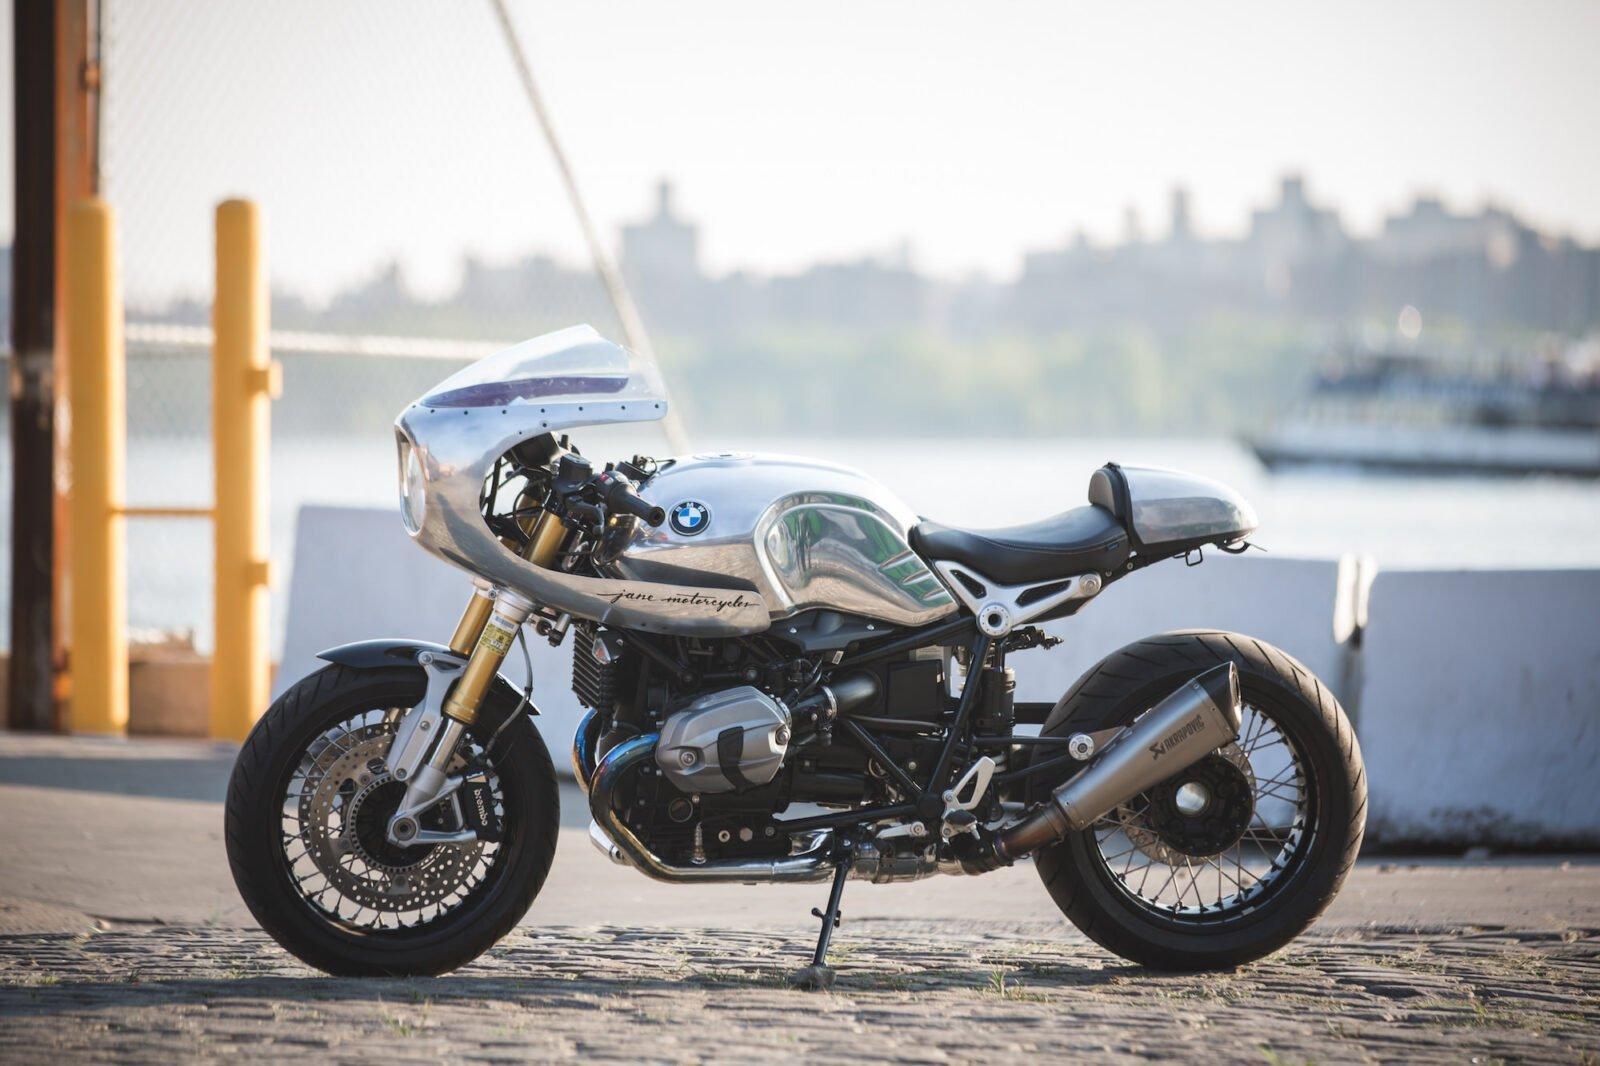 BMW R nineT Motorcycle 8 1600x1066 - BMW R nineT by JANE Motorcycles